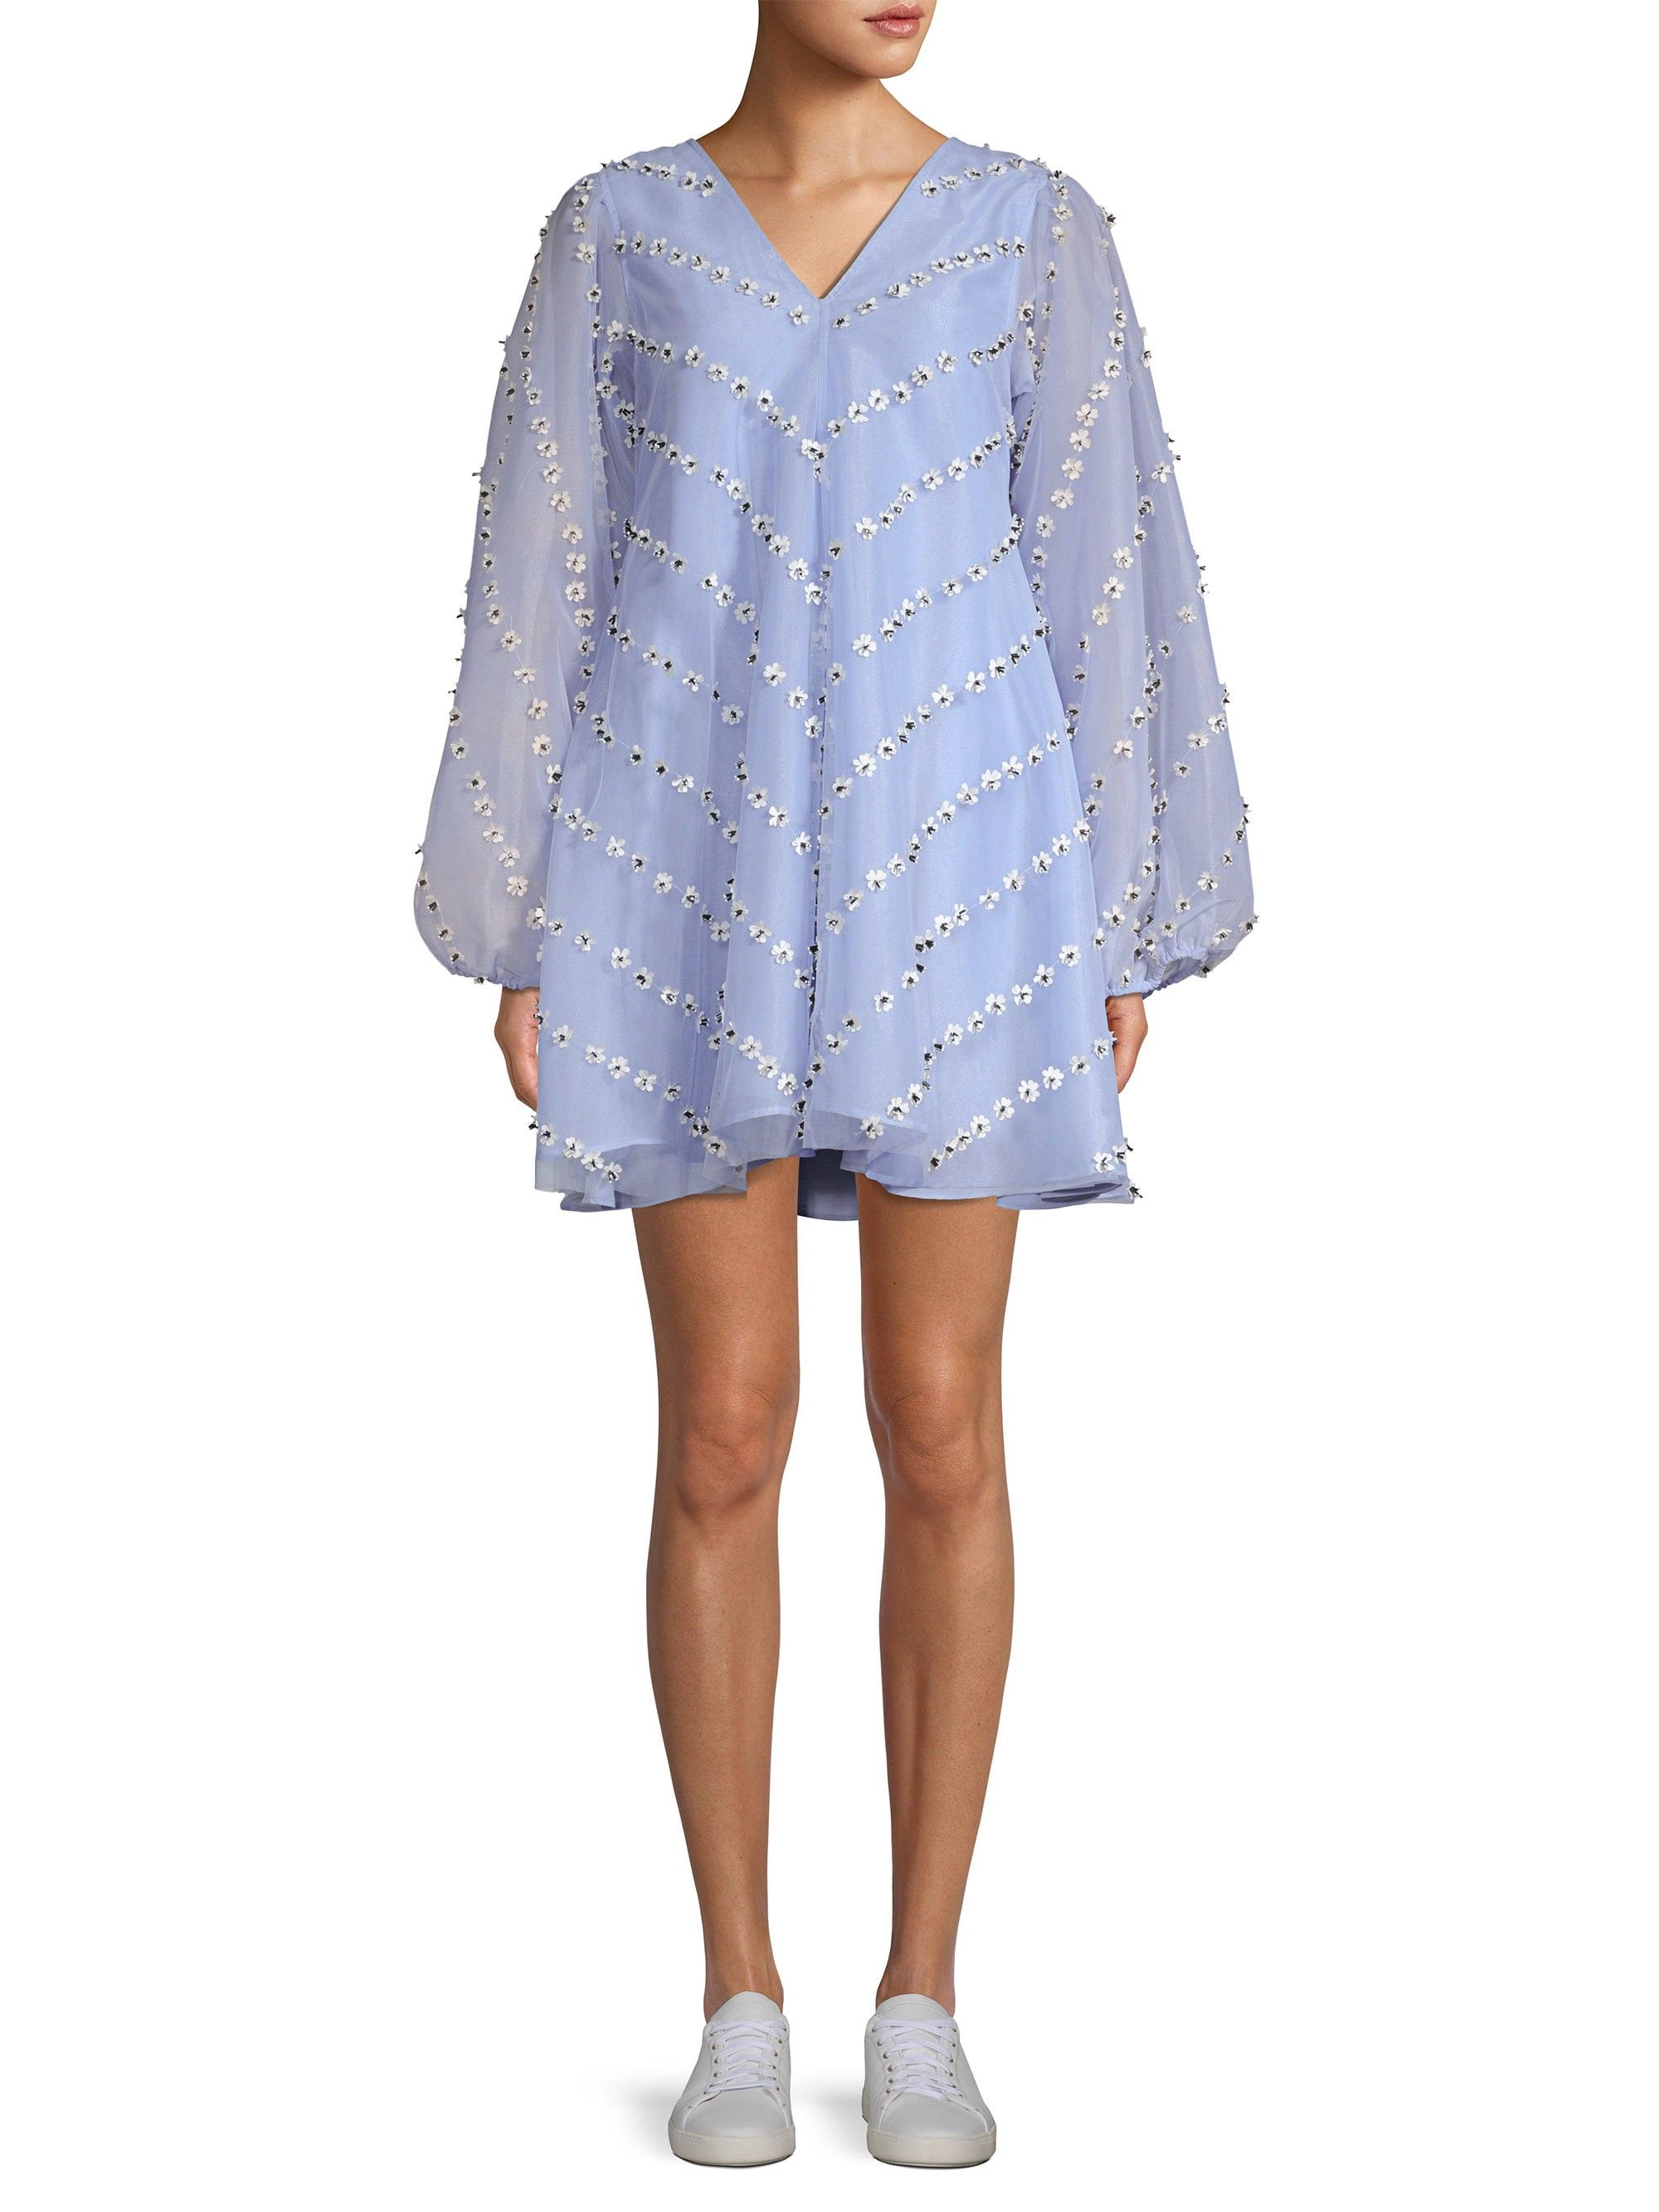 ac776105d581 Ganni Rosenfeld Daisy Appliqué Mini Trapeze Dress - Serenity Blue 42 (8)